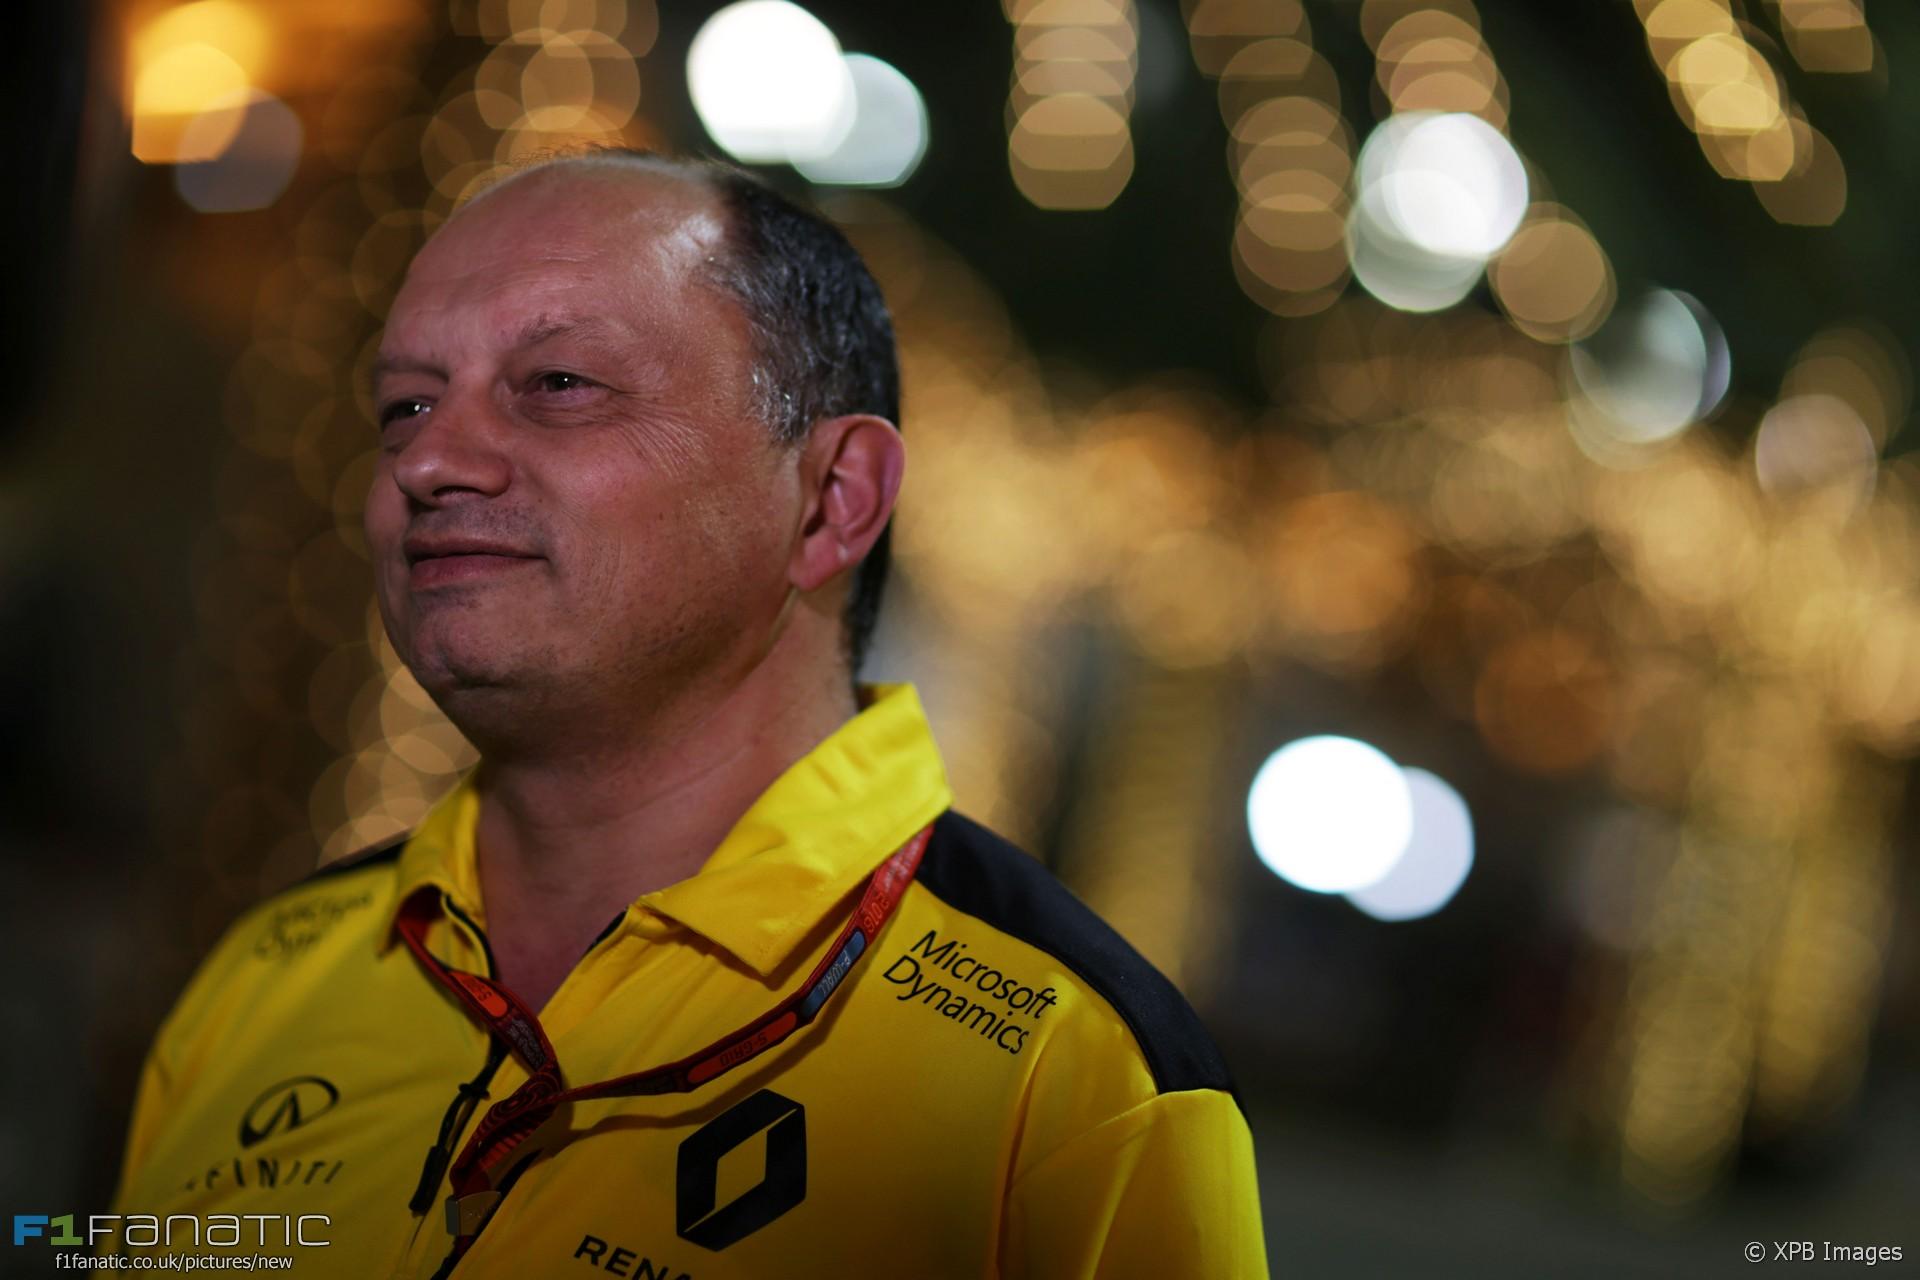 Frederic Vasseur, Renault, Bahrain International Circuit, 2016